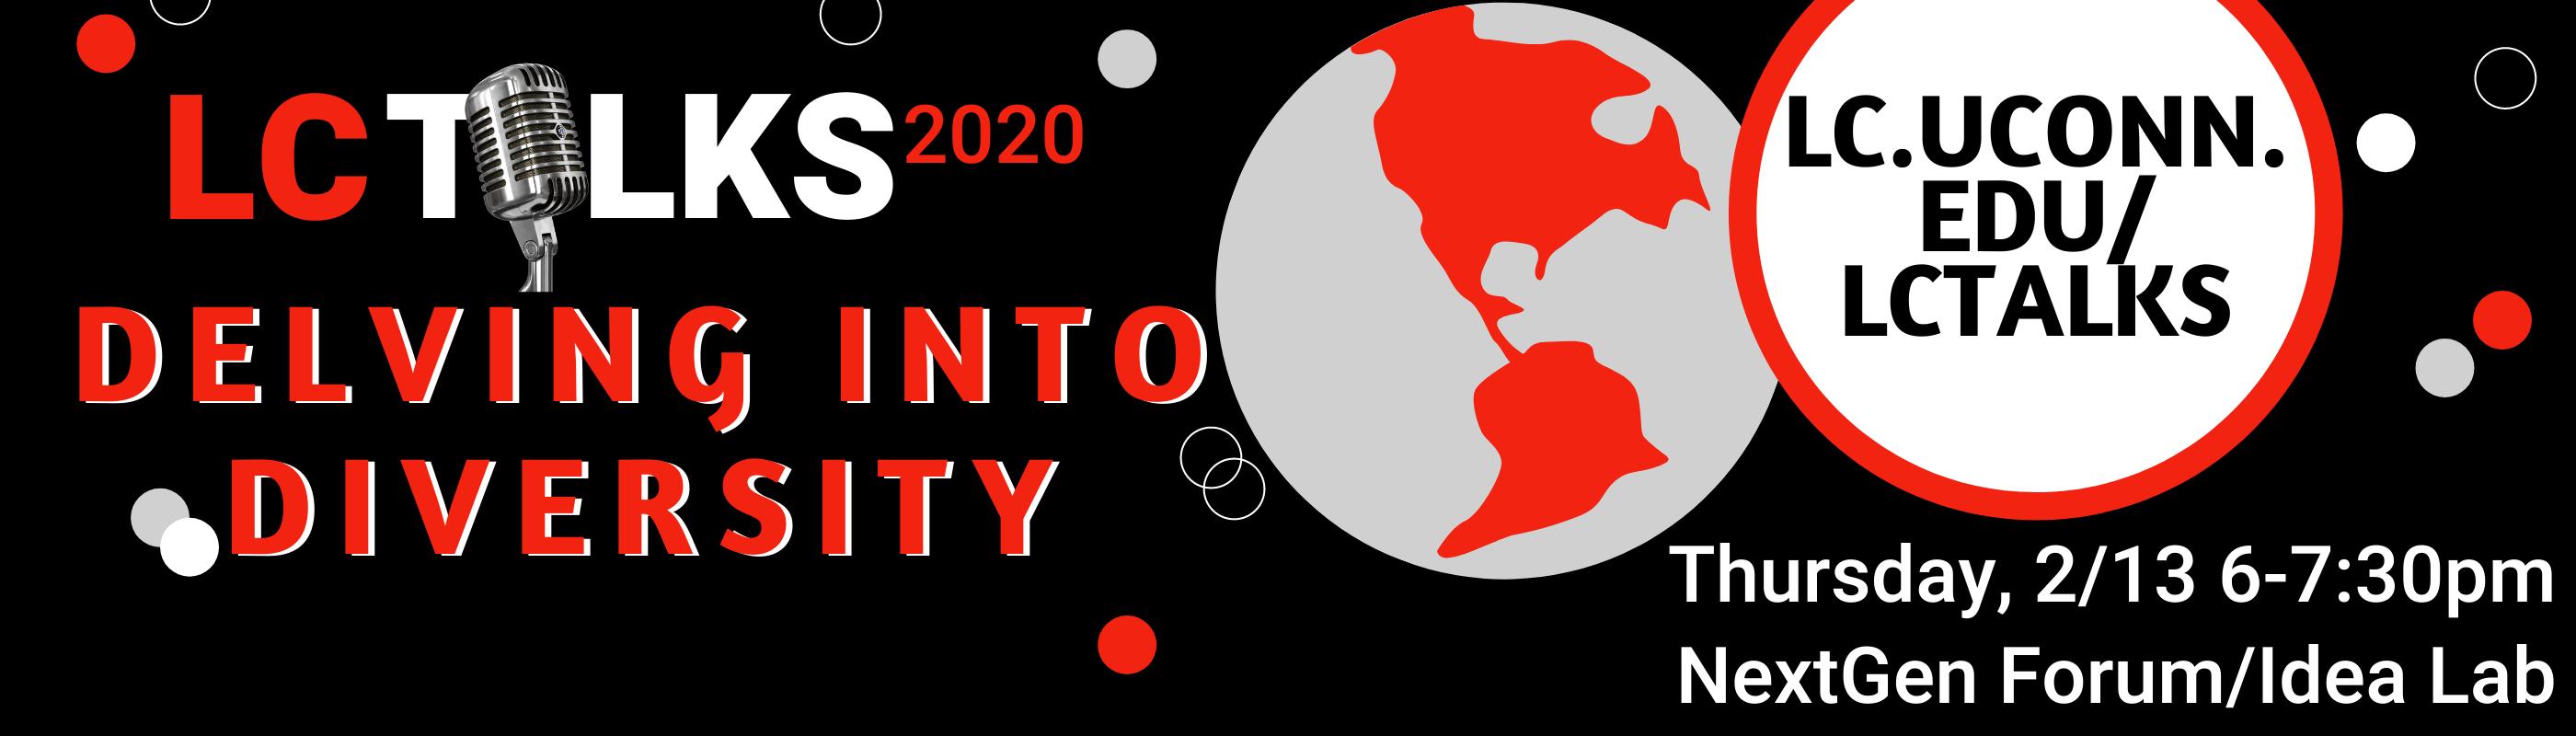 LC TALKS 2020 Web Banner